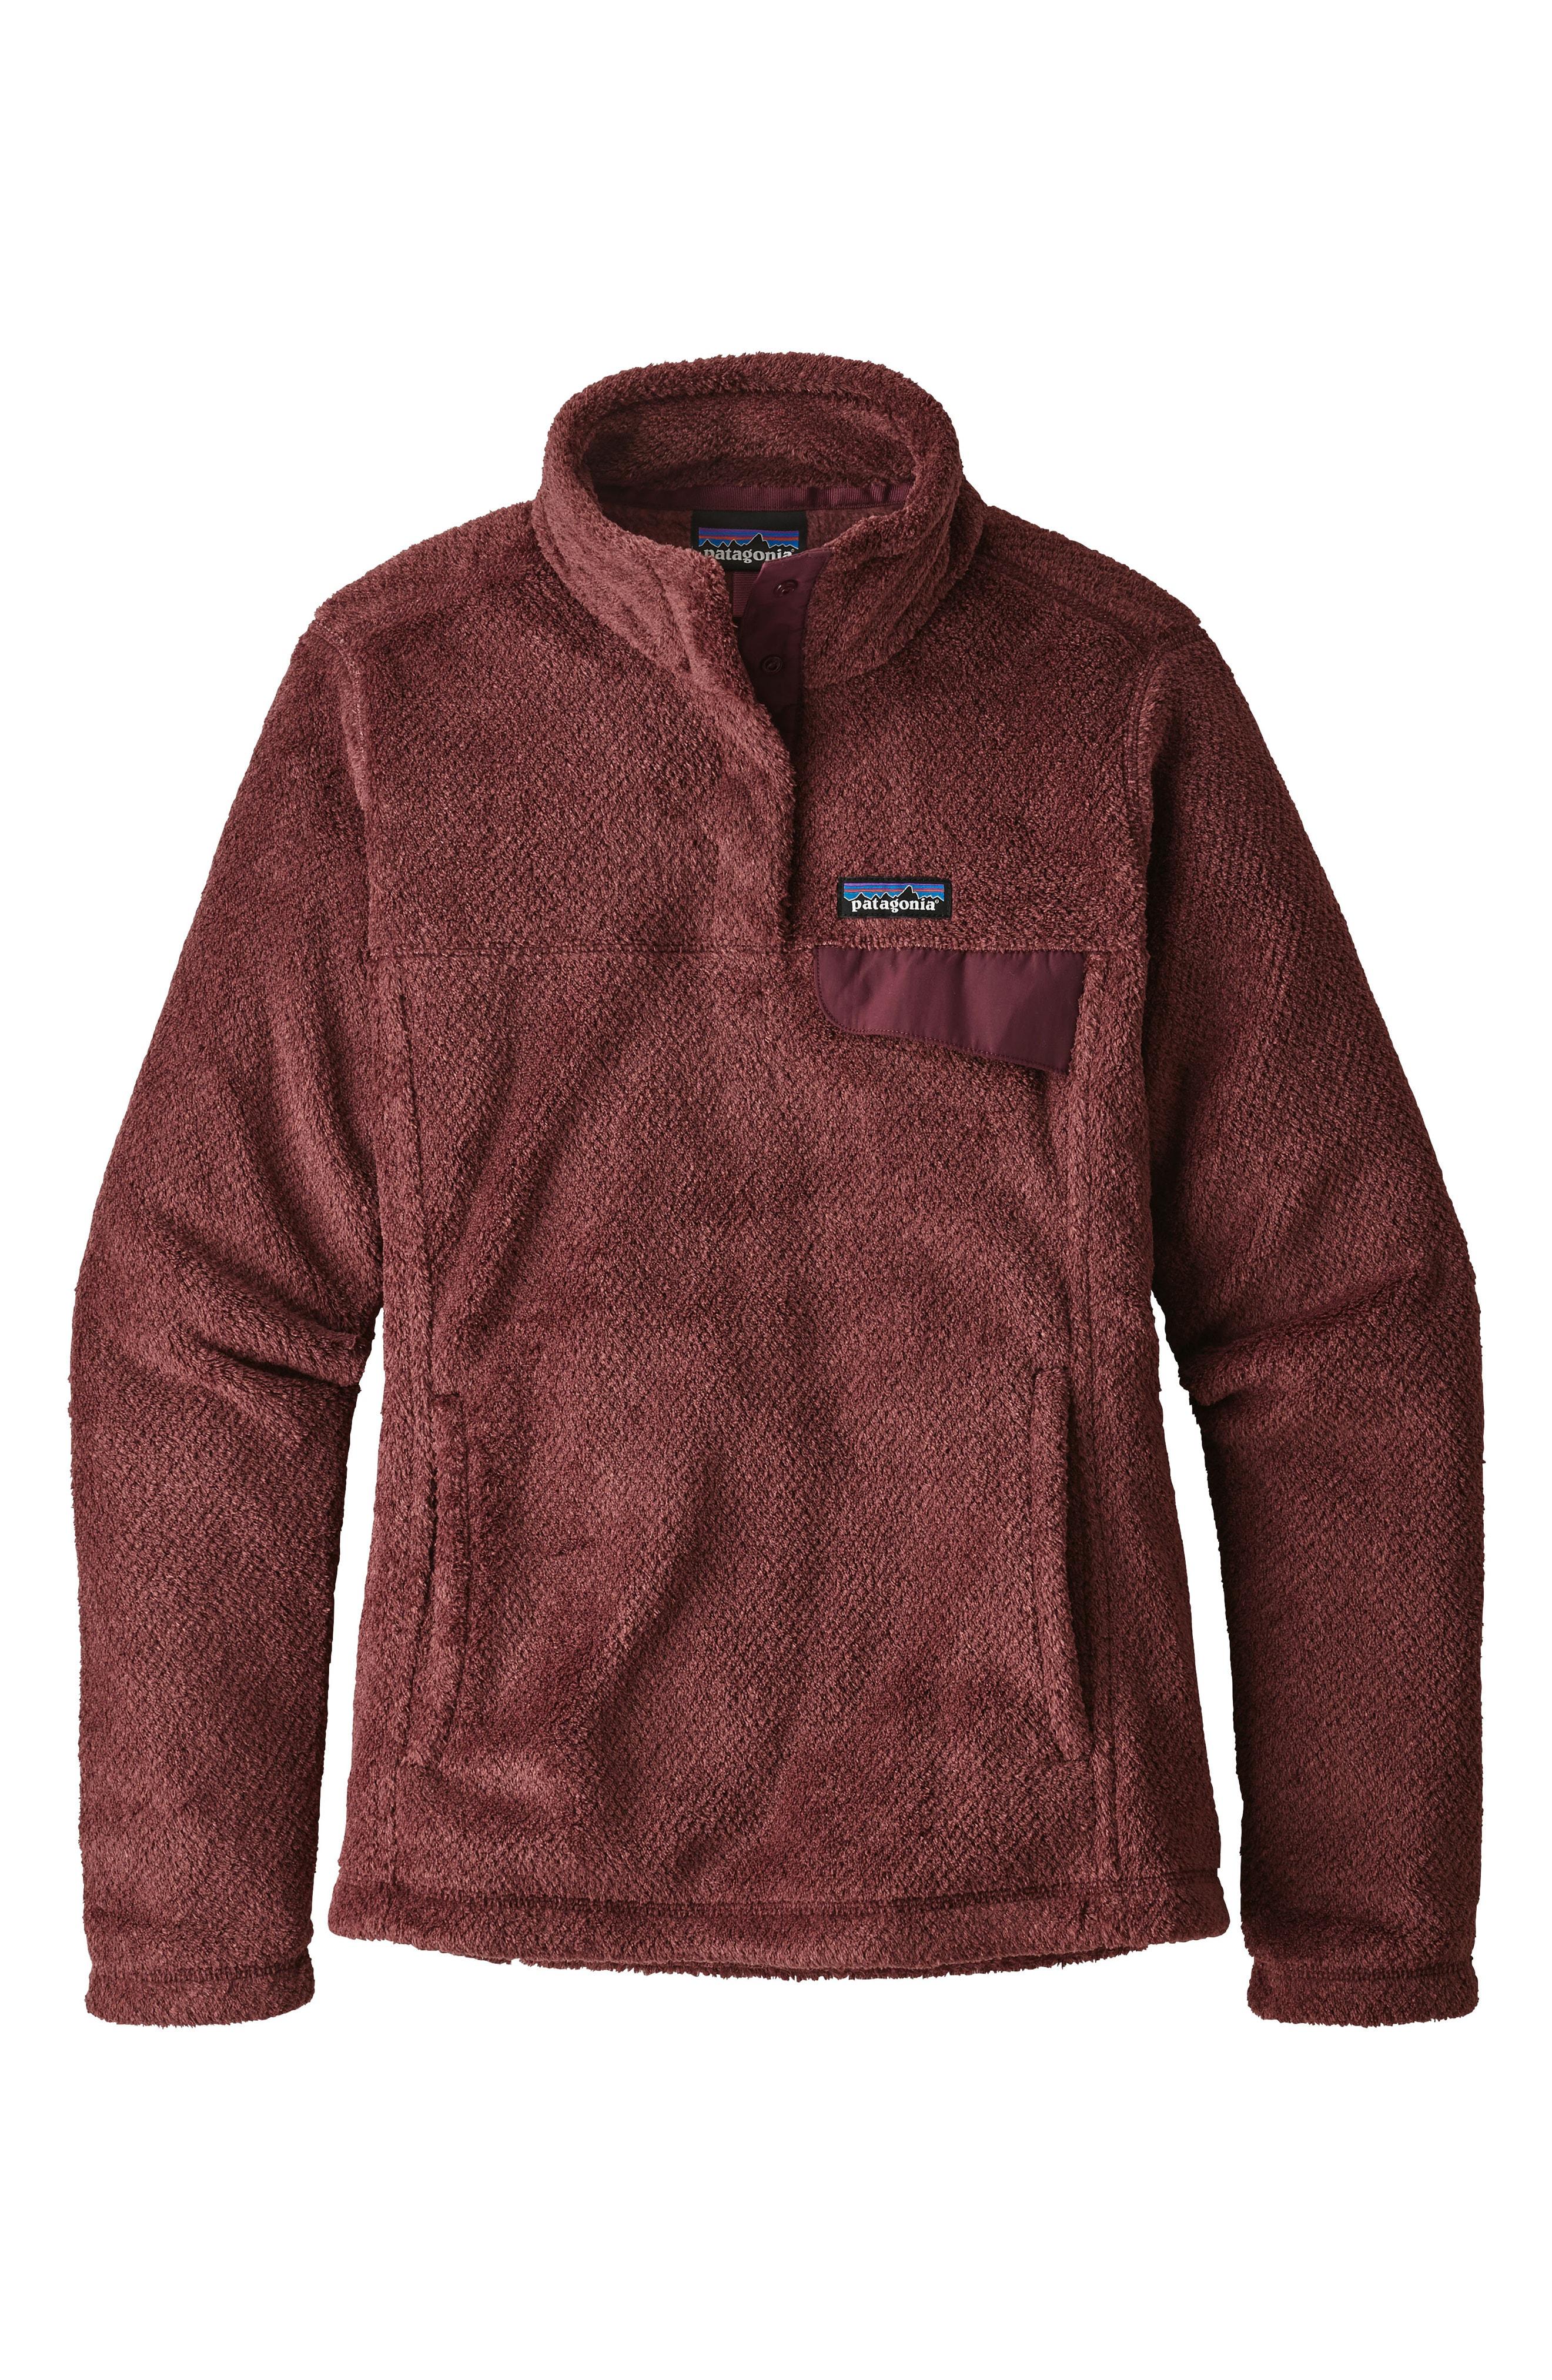 Patagonia Re-Tool Snap-T Fleece Pullover In Kiln Pink - Dark Currant X-Dye